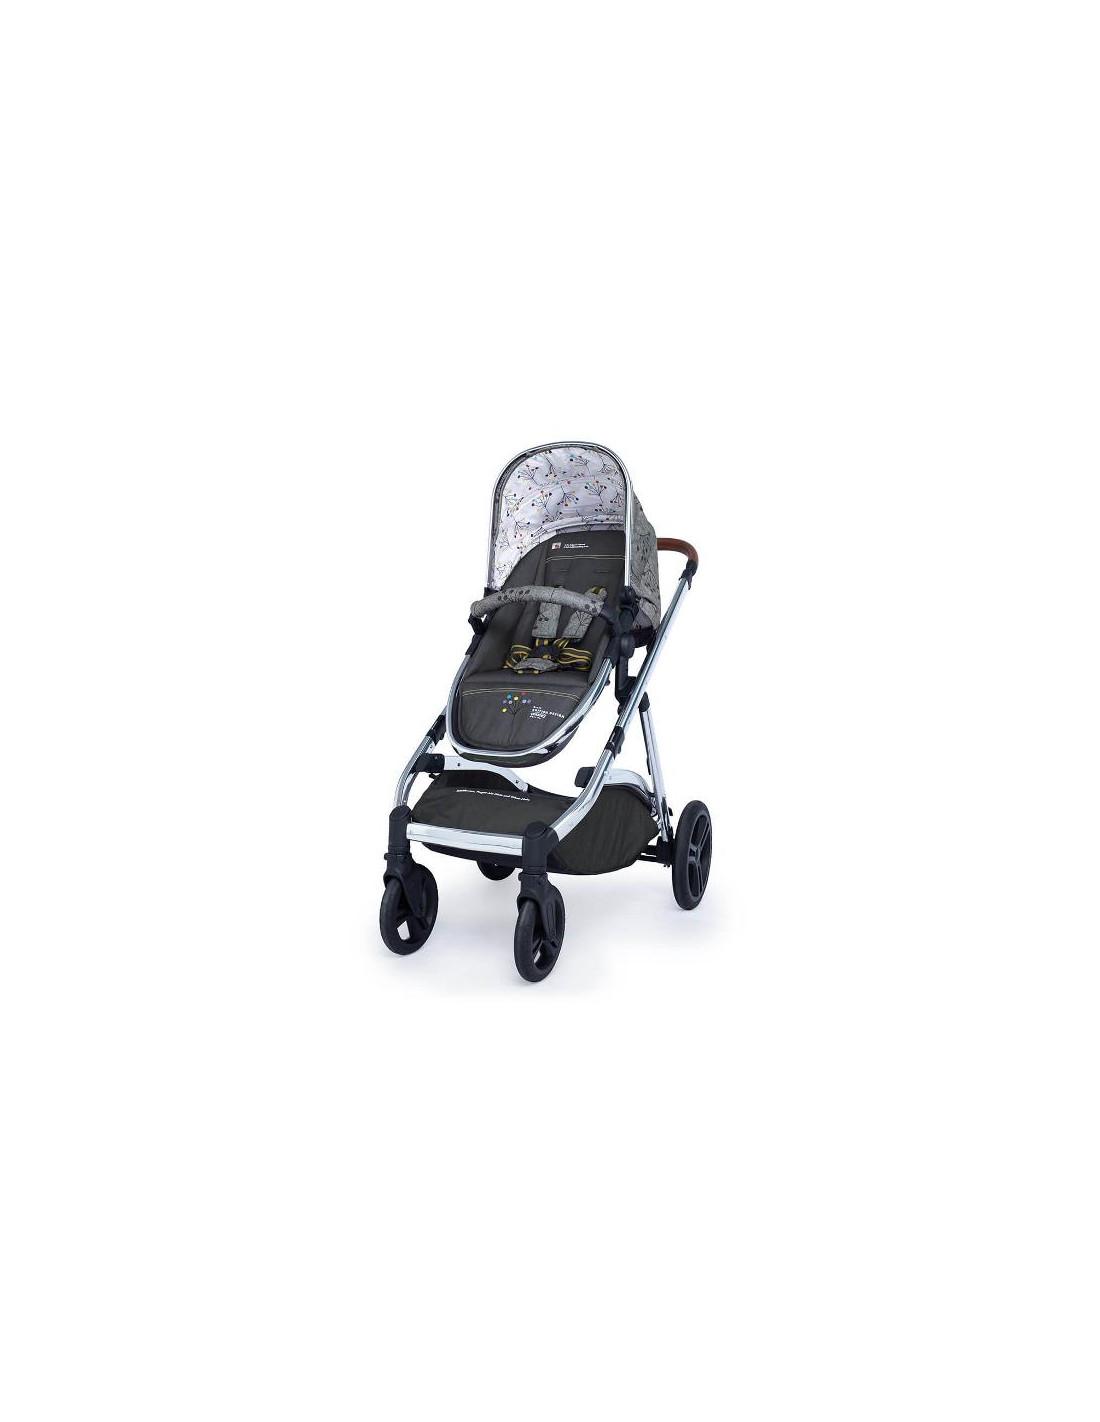 Coche bebé 3 en 1 Wow XL | Envío 24h